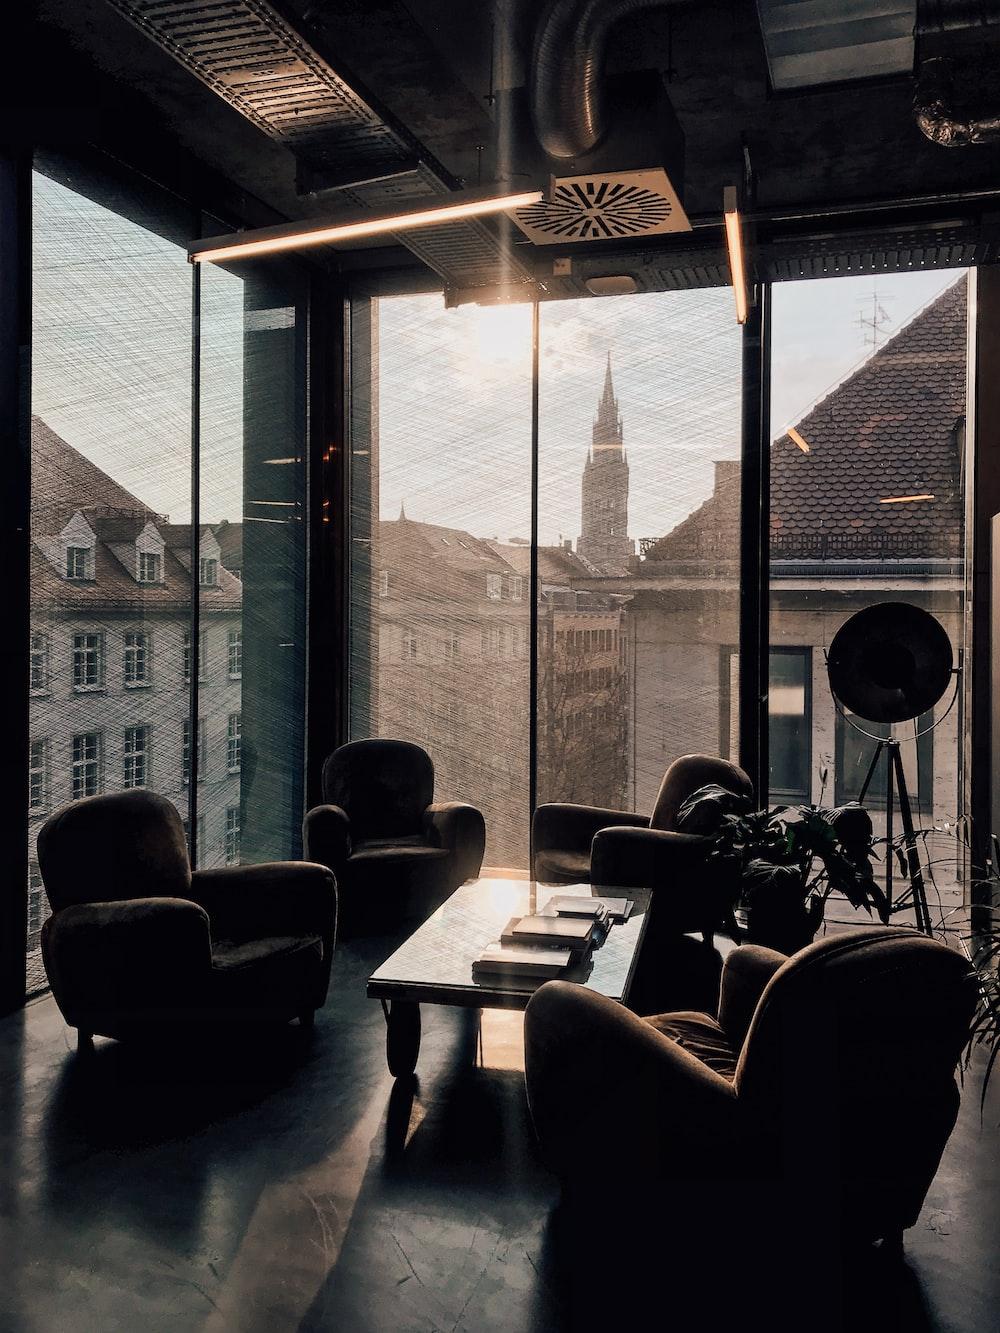 vacant sofa chairs beside glass window